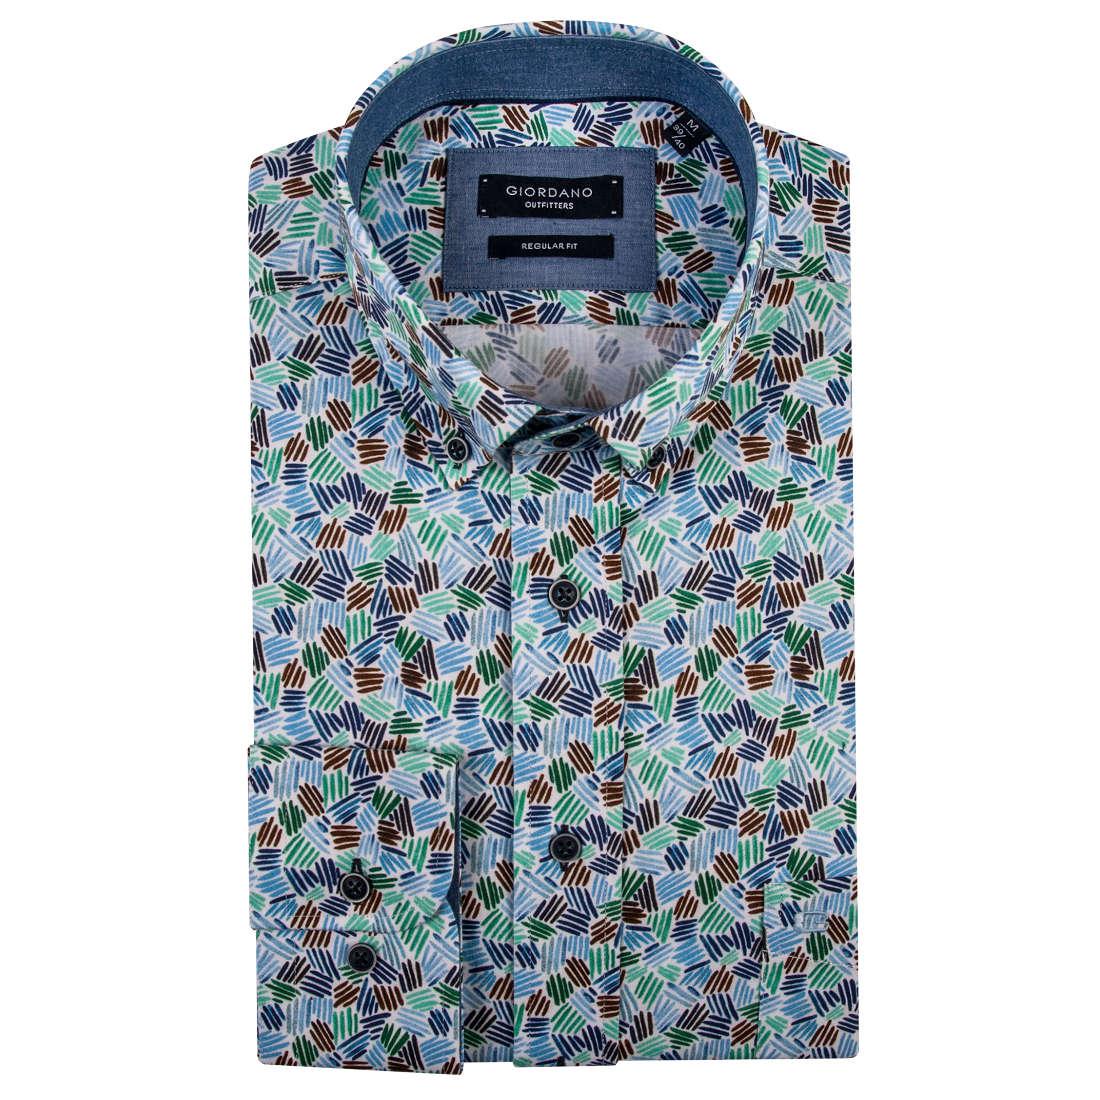 Giordano overhemd Regular Fit 91-6020 in het Groen